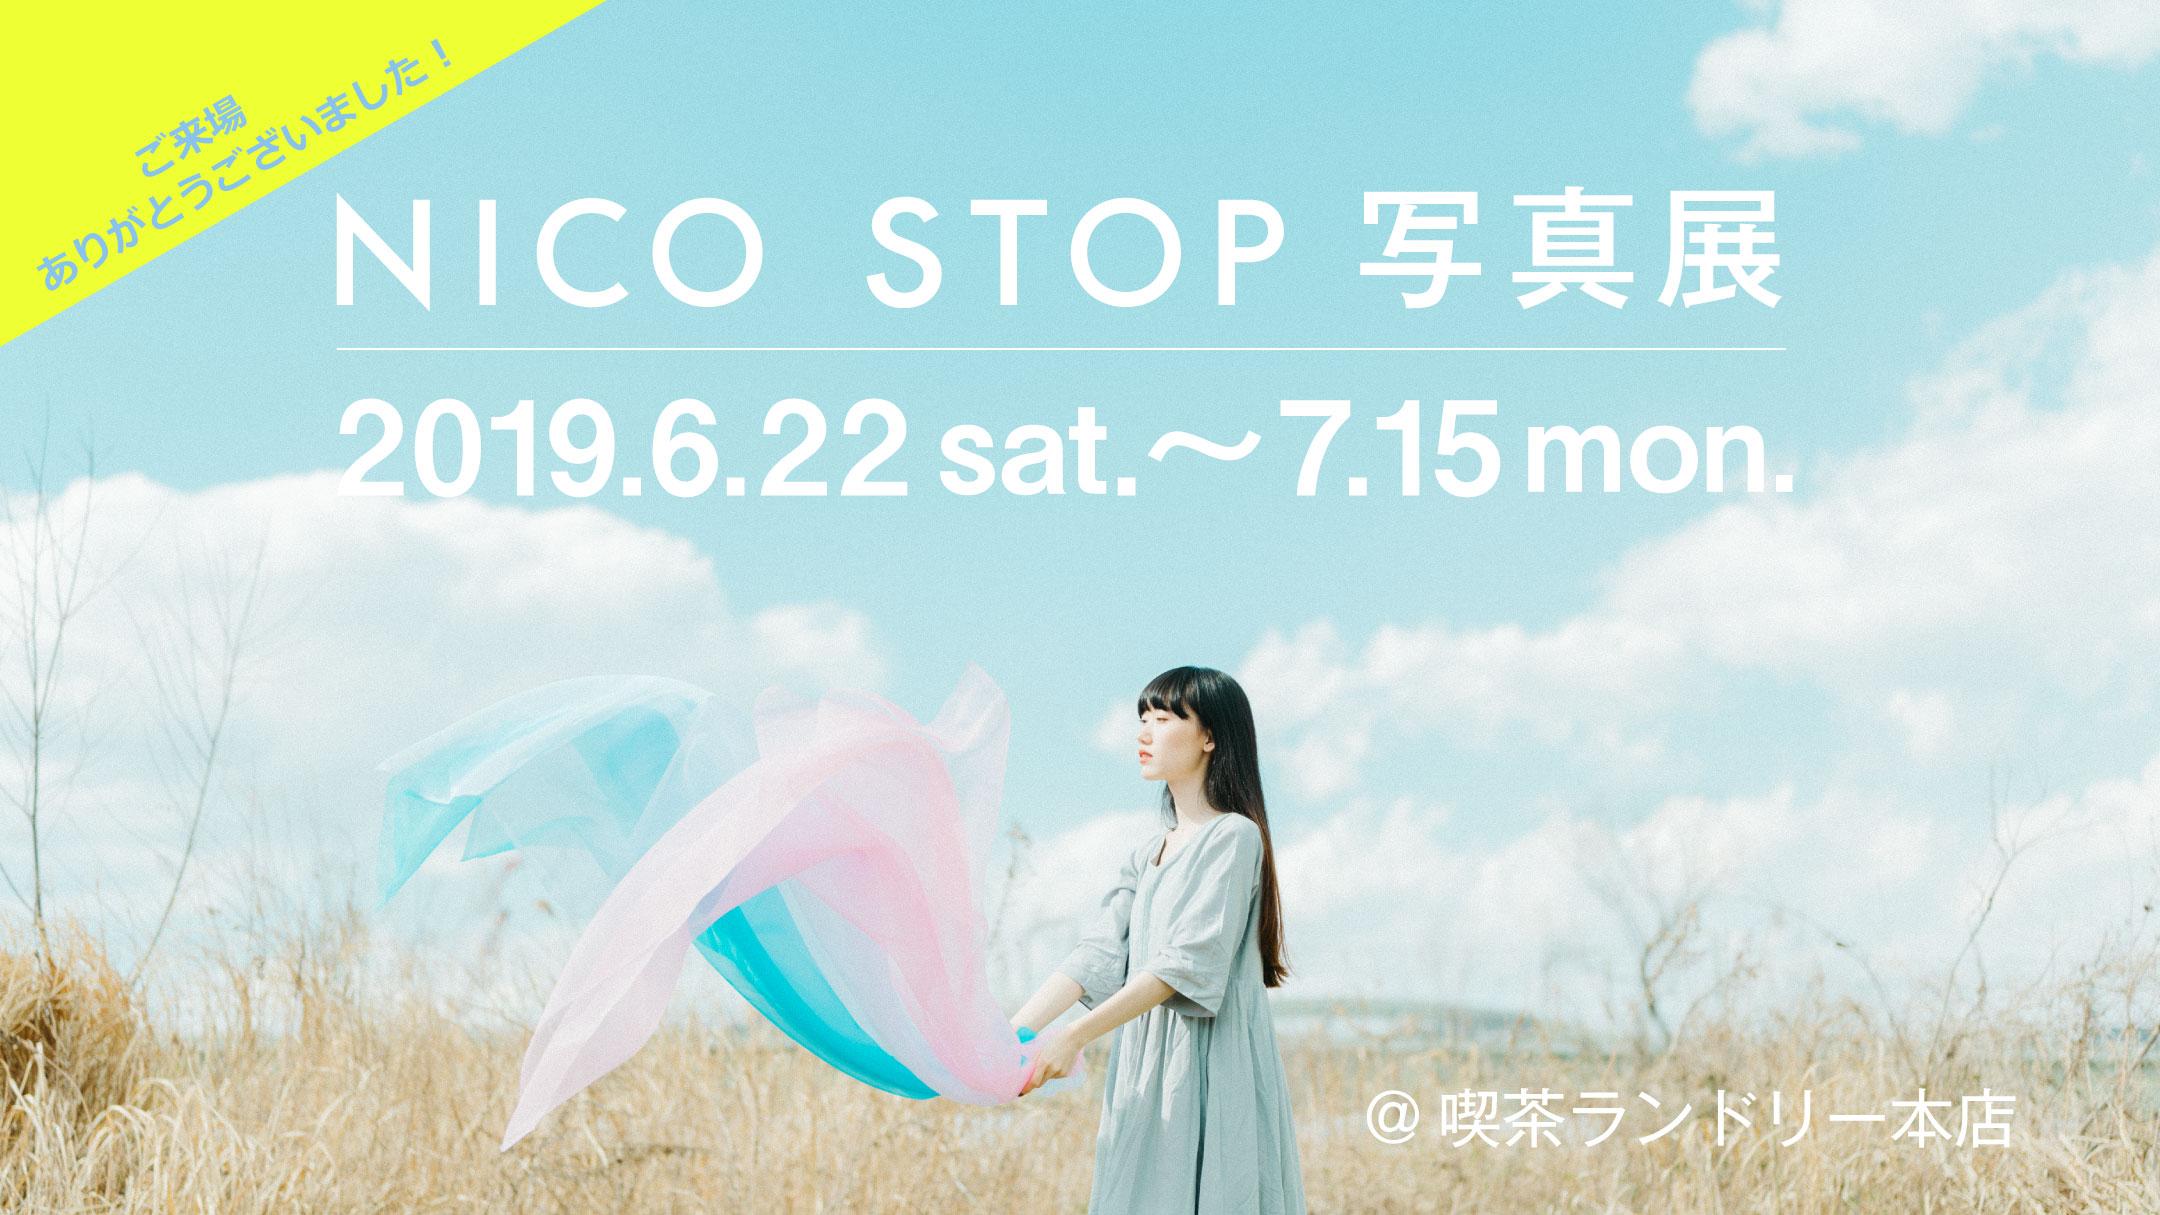 NICO STOP写真展開催